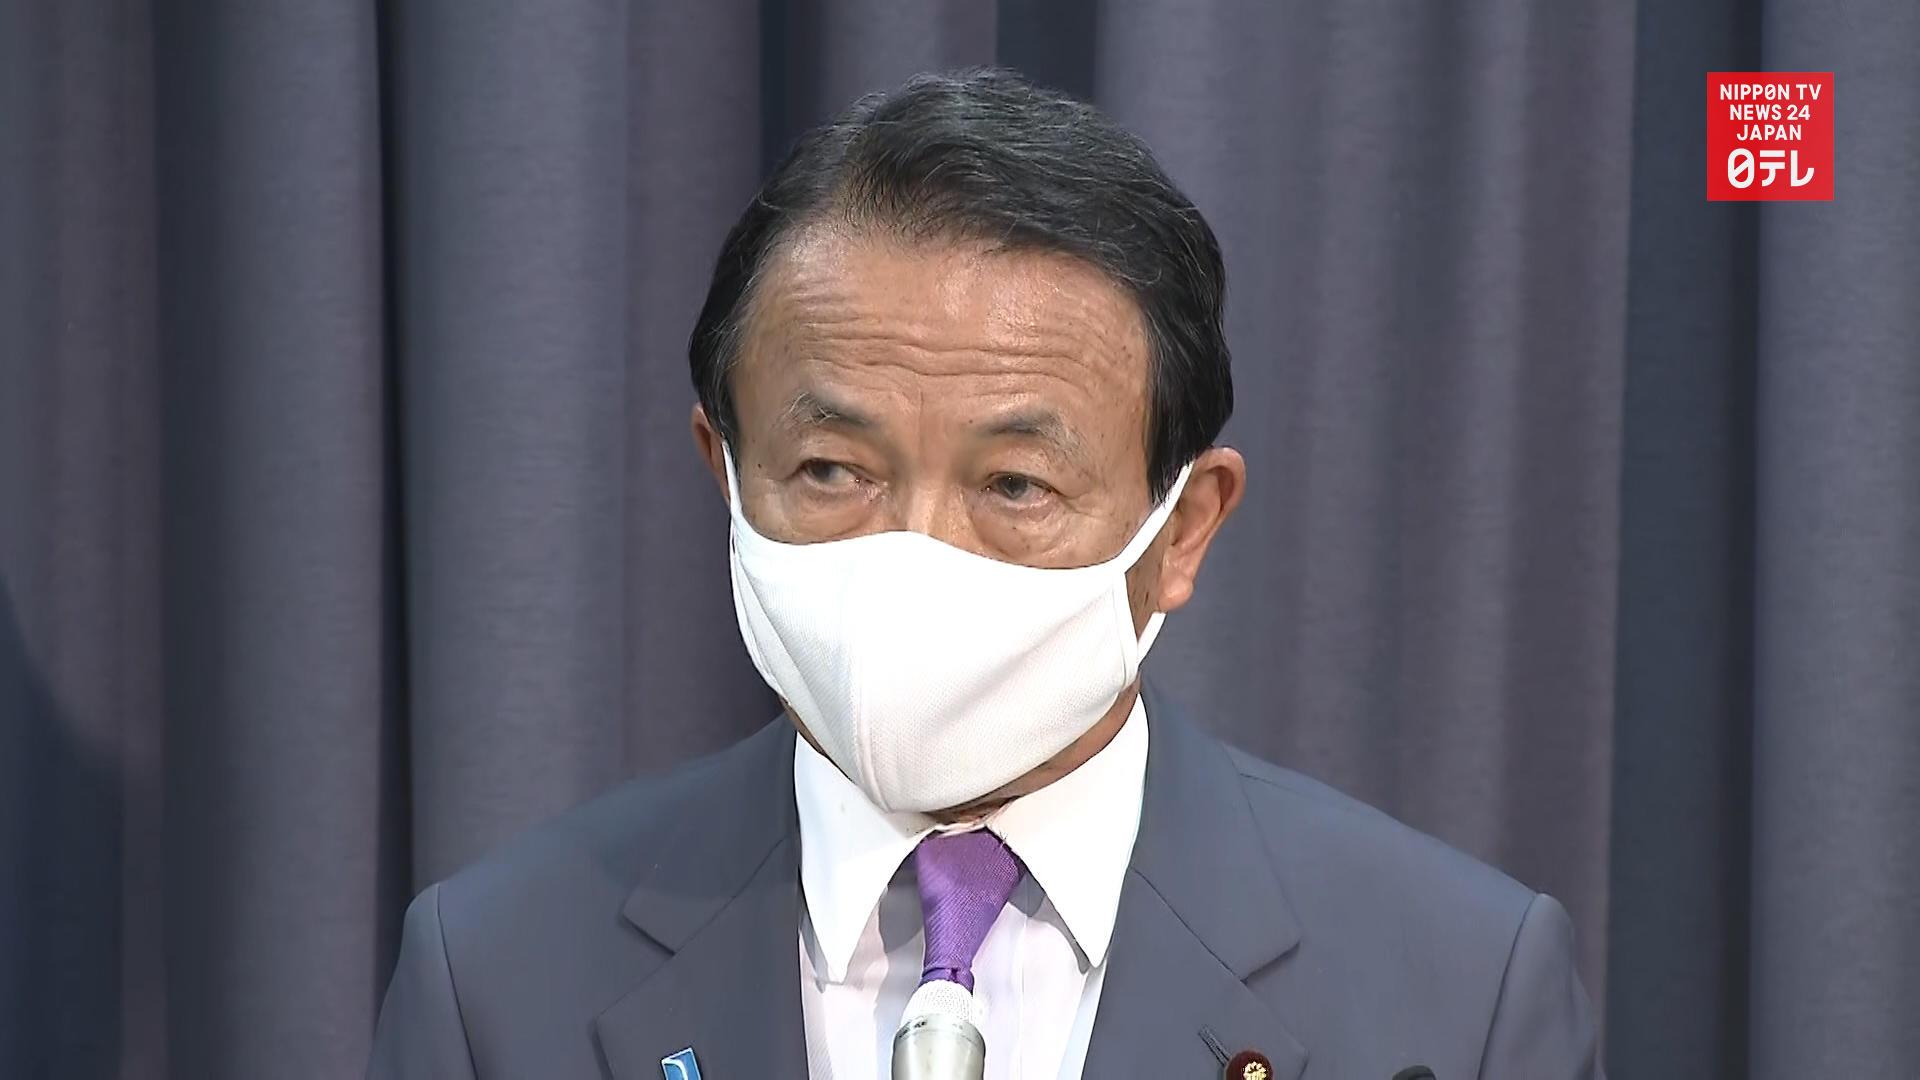 Japan's additional 117.1 trillion yen stimulus package